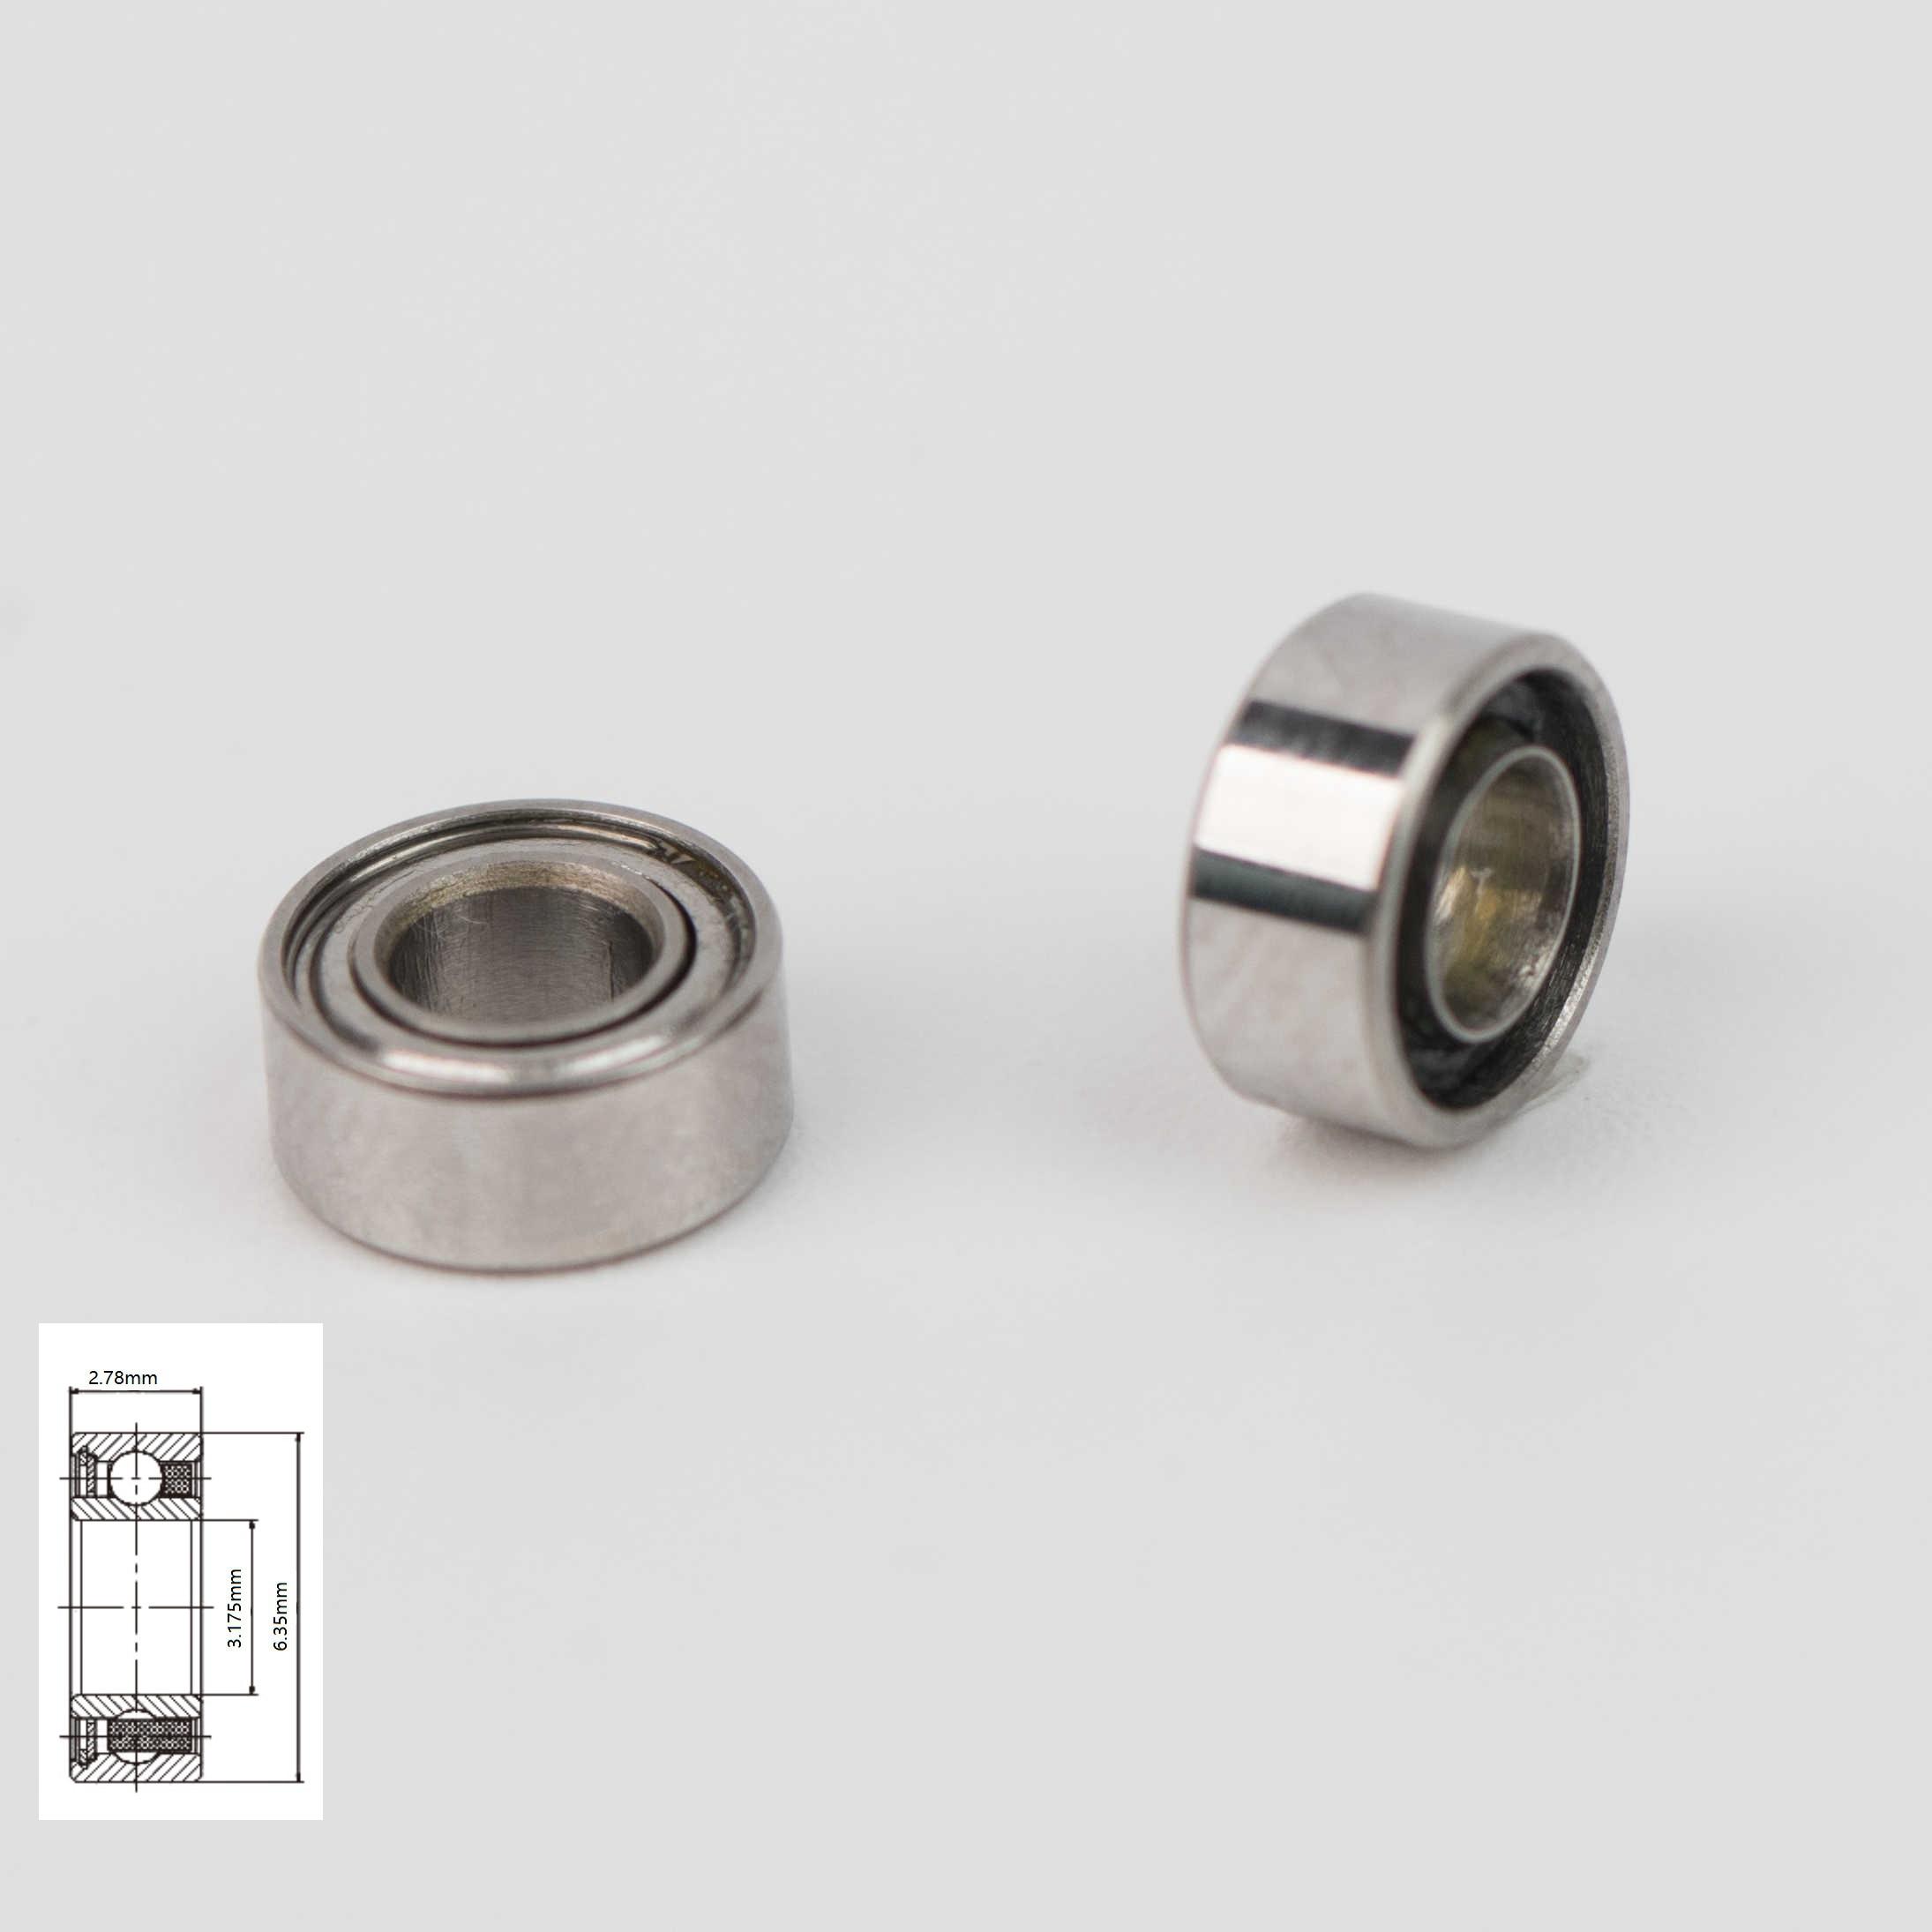 10pcs high speed Sirona T2 T3 handpiece turbine cartridge rotor bearings SR144TLZWN